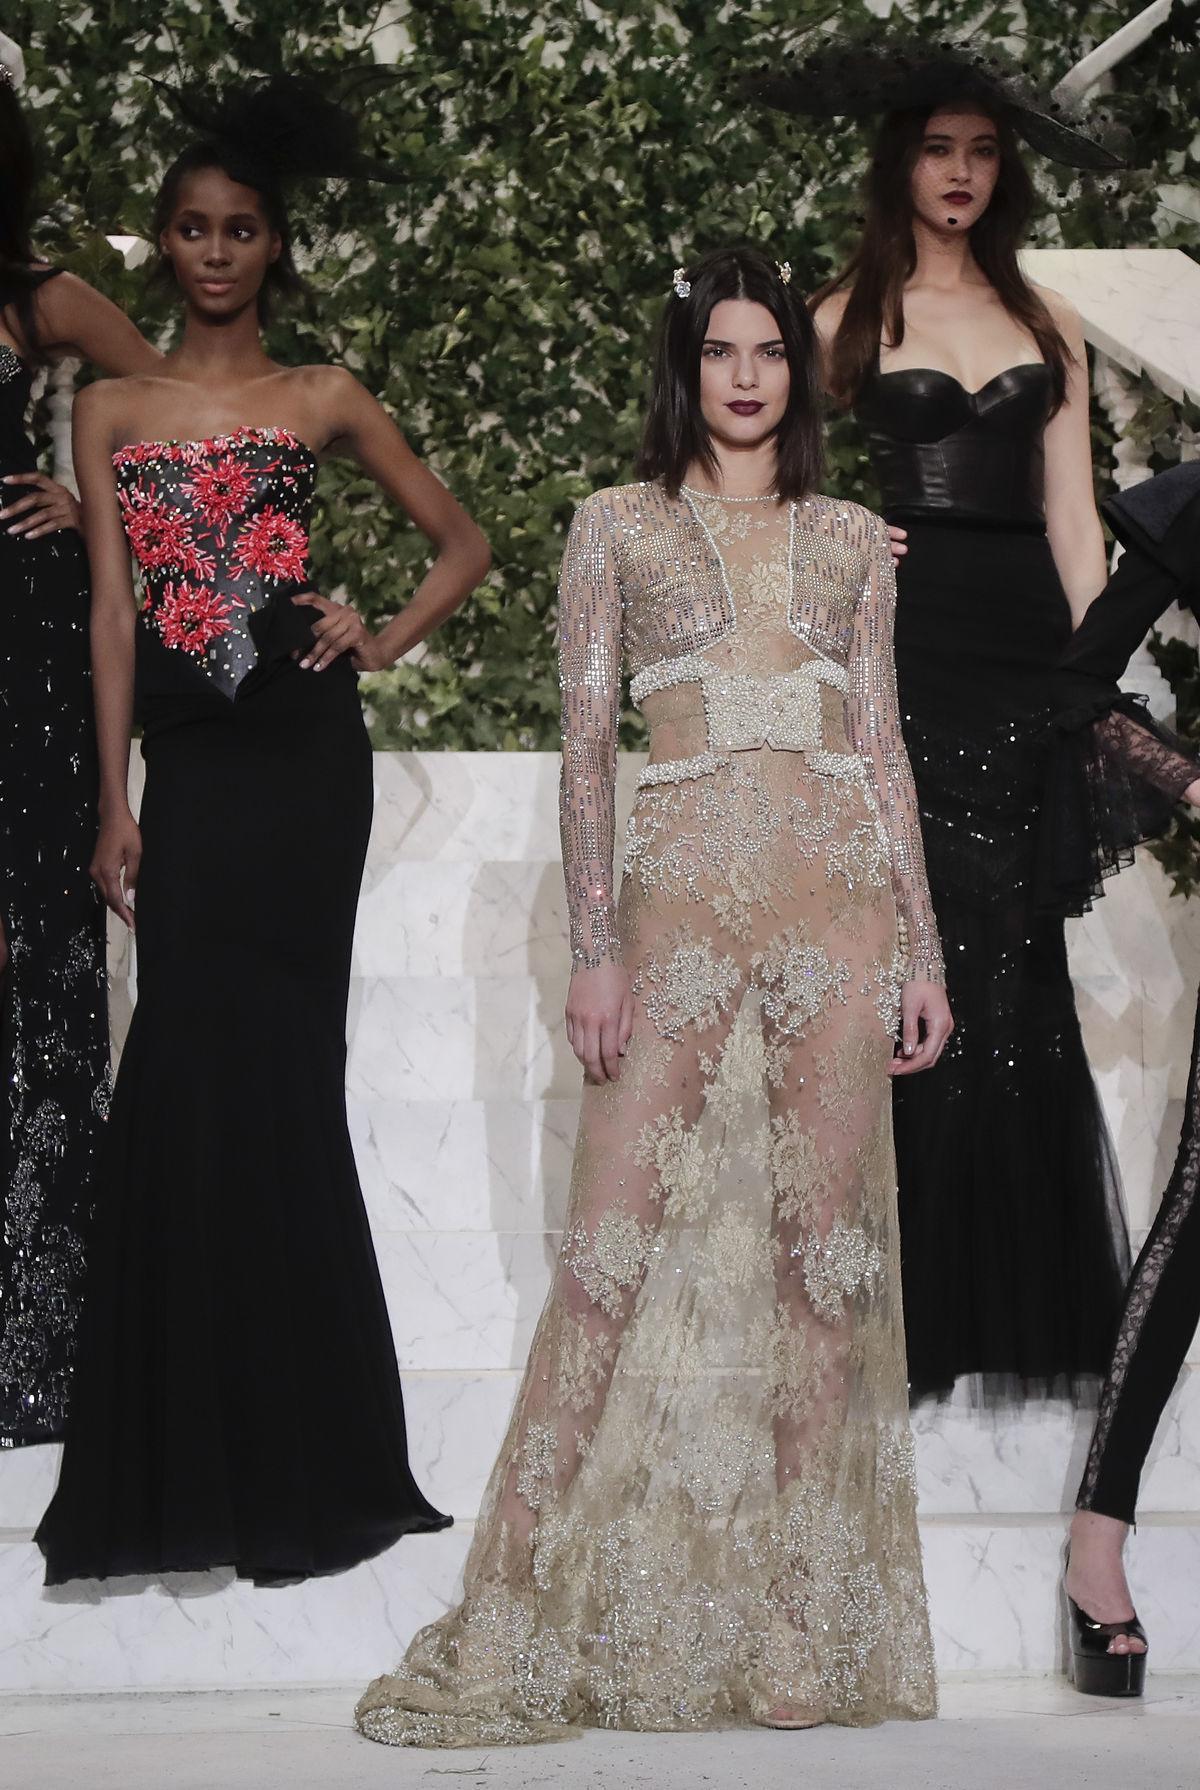 Topmodelka Kendall Jenner predvádzala kolekciu La Perla v New Yorku.